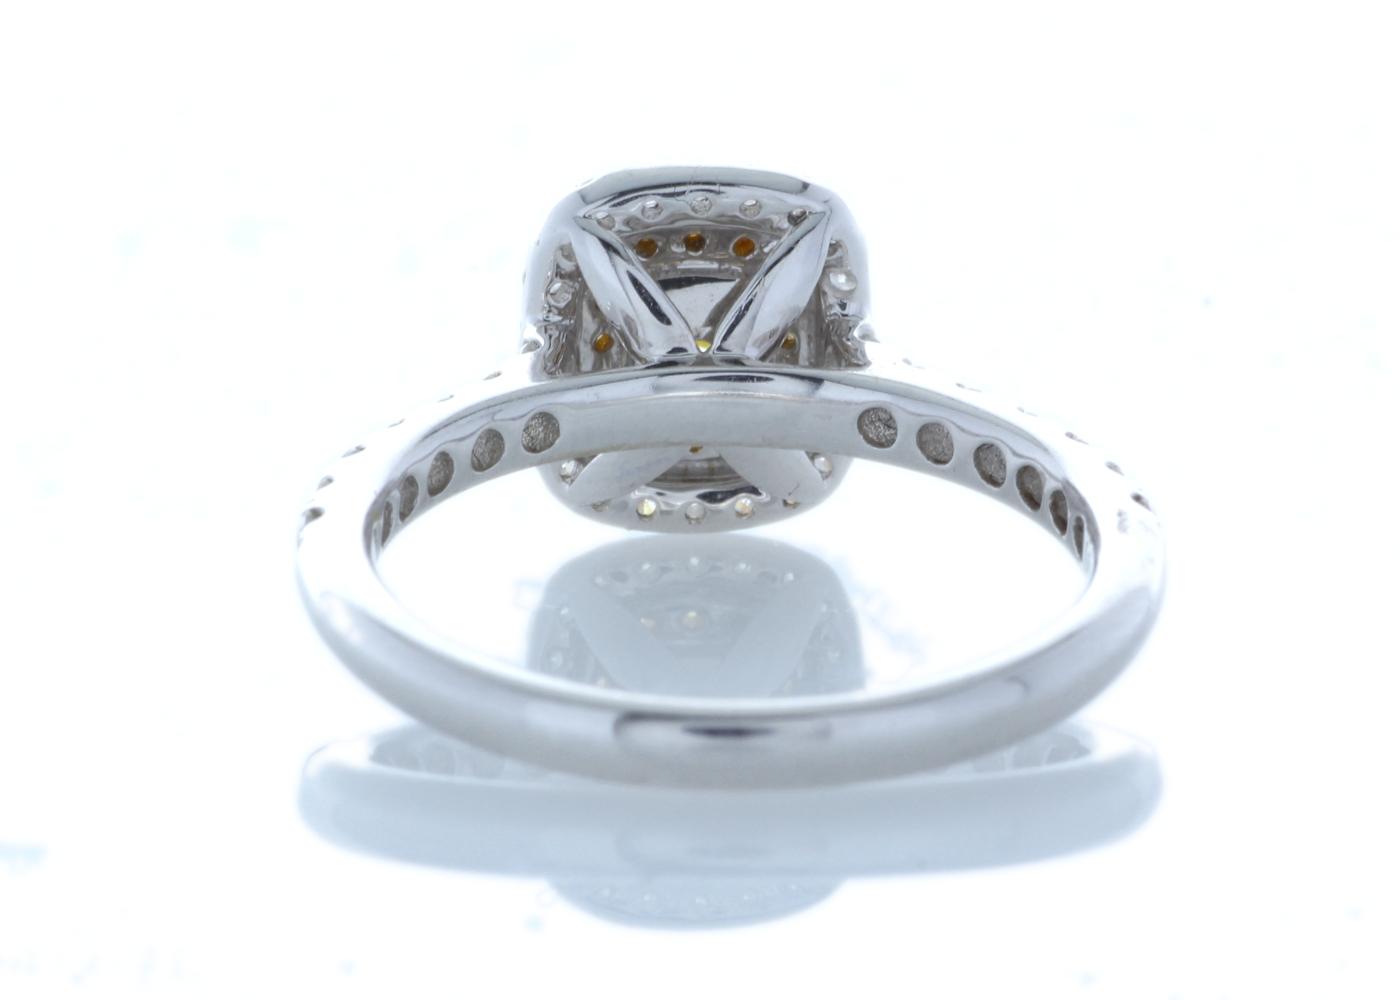 18ct White Gold Halo Set Ring 0.70 Carats - Image 3 of 5